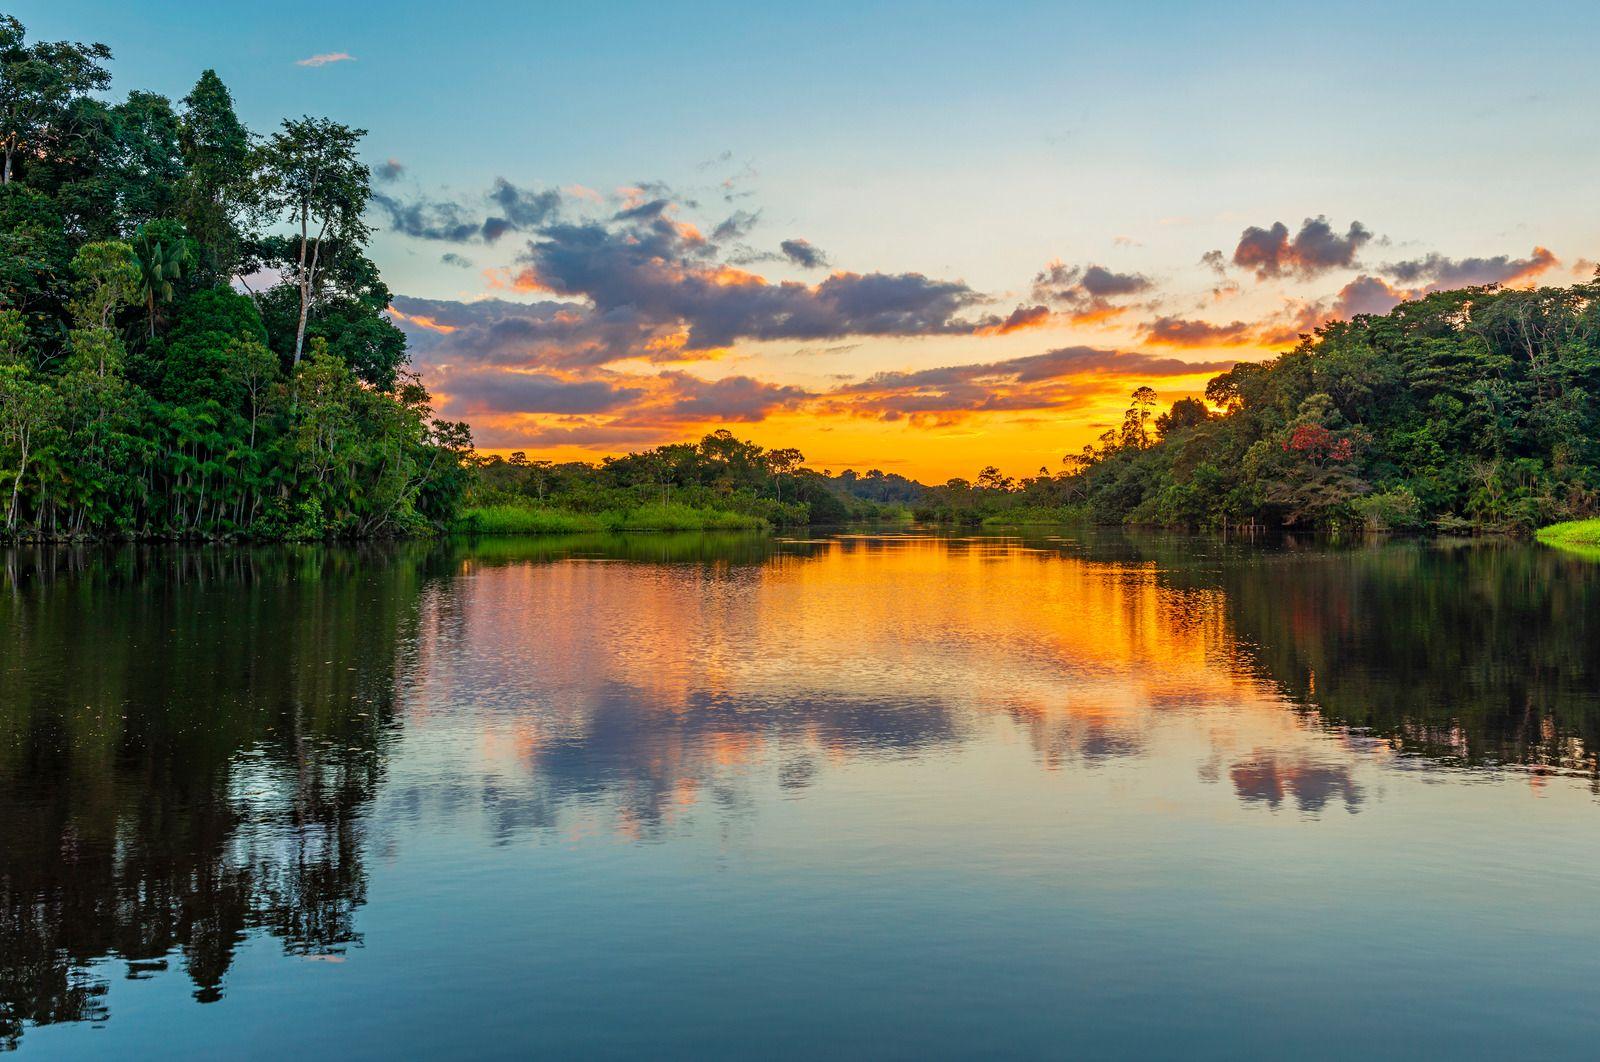 forêt amazonienne.jpg